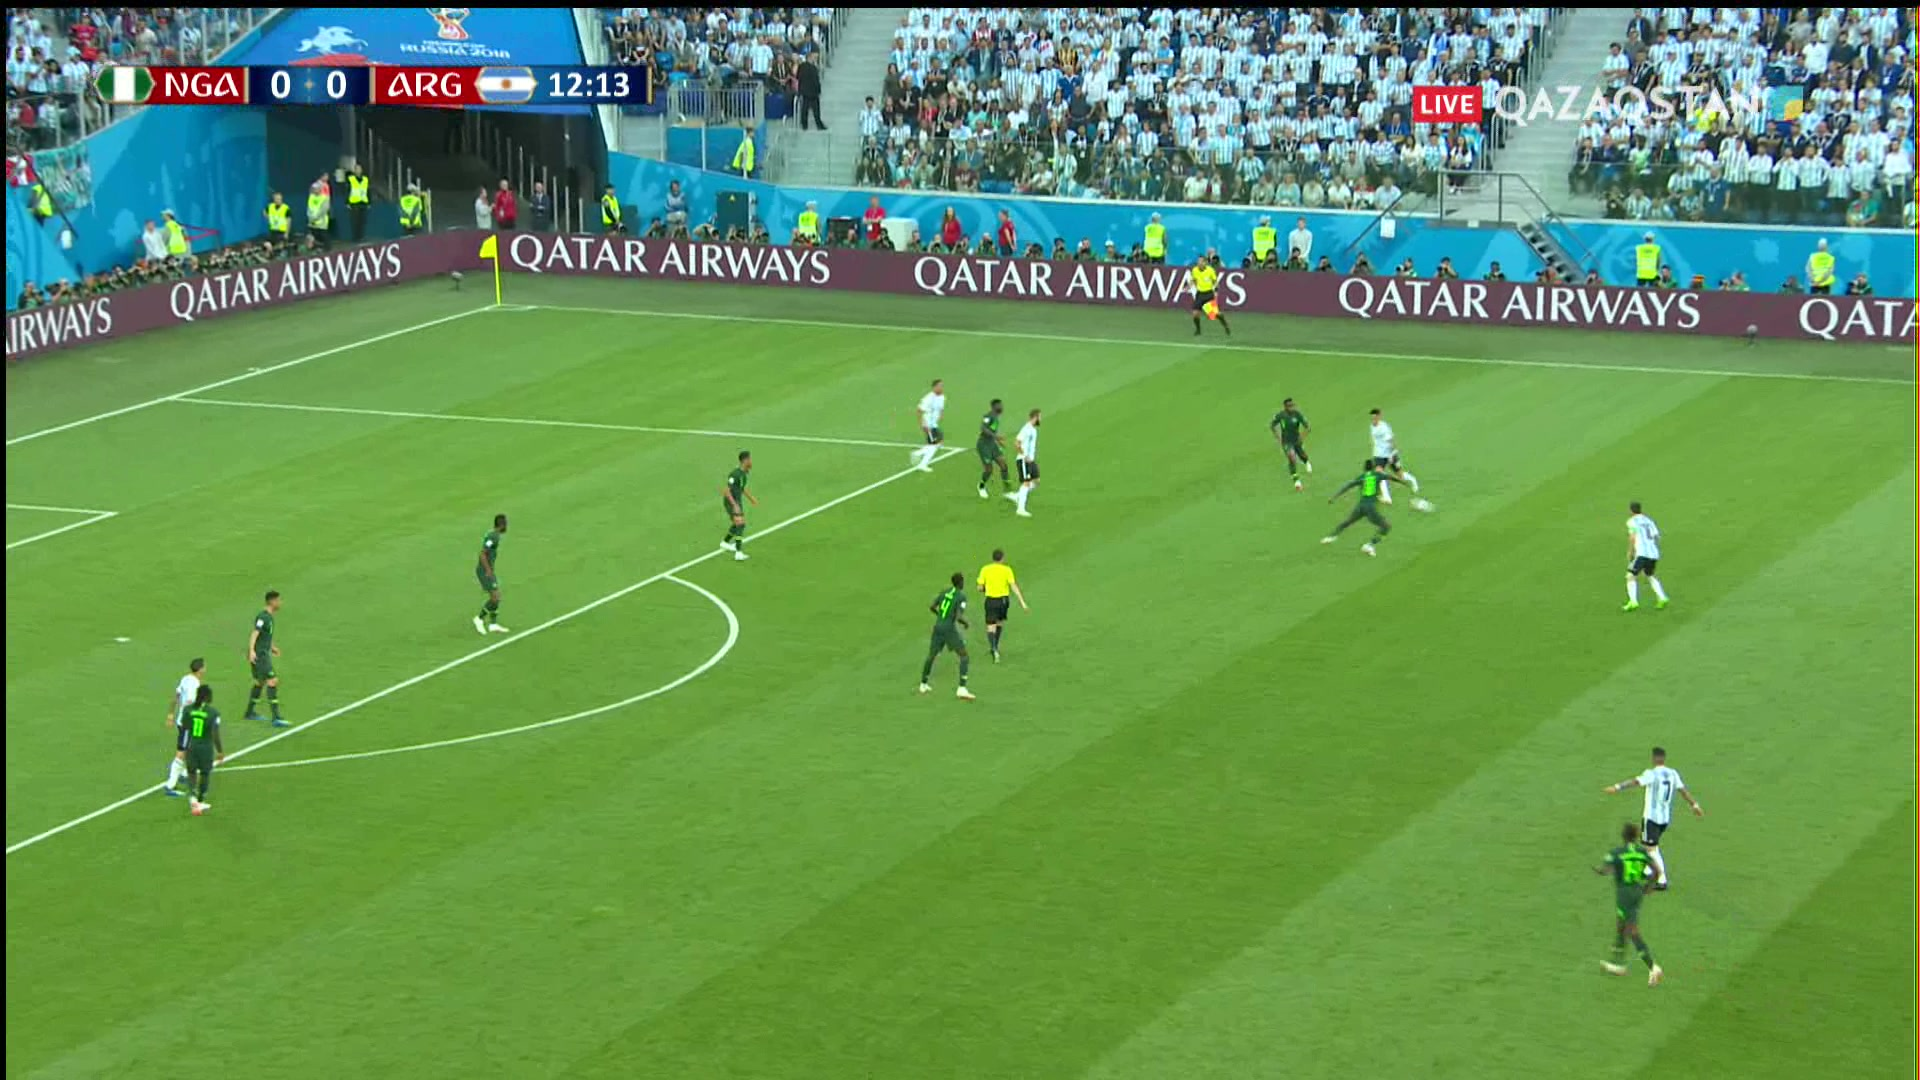 ӘЧ-2018. Нигерия – Аргентина |1 – 2| Шолу